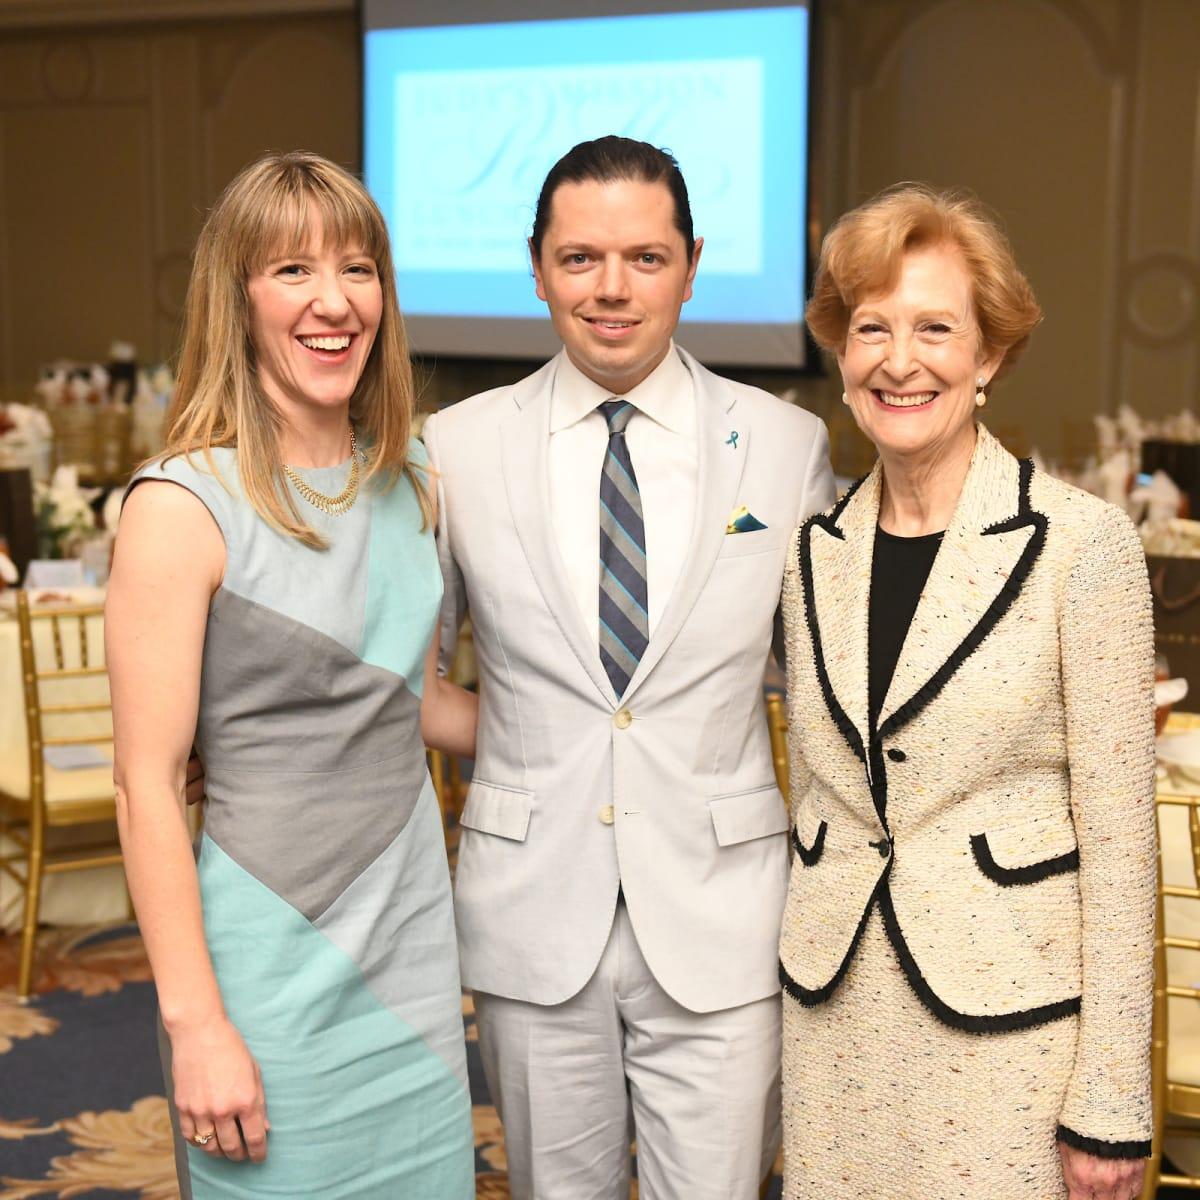 Michelle Phillips, David Peck and Susan Baker/JudysMission